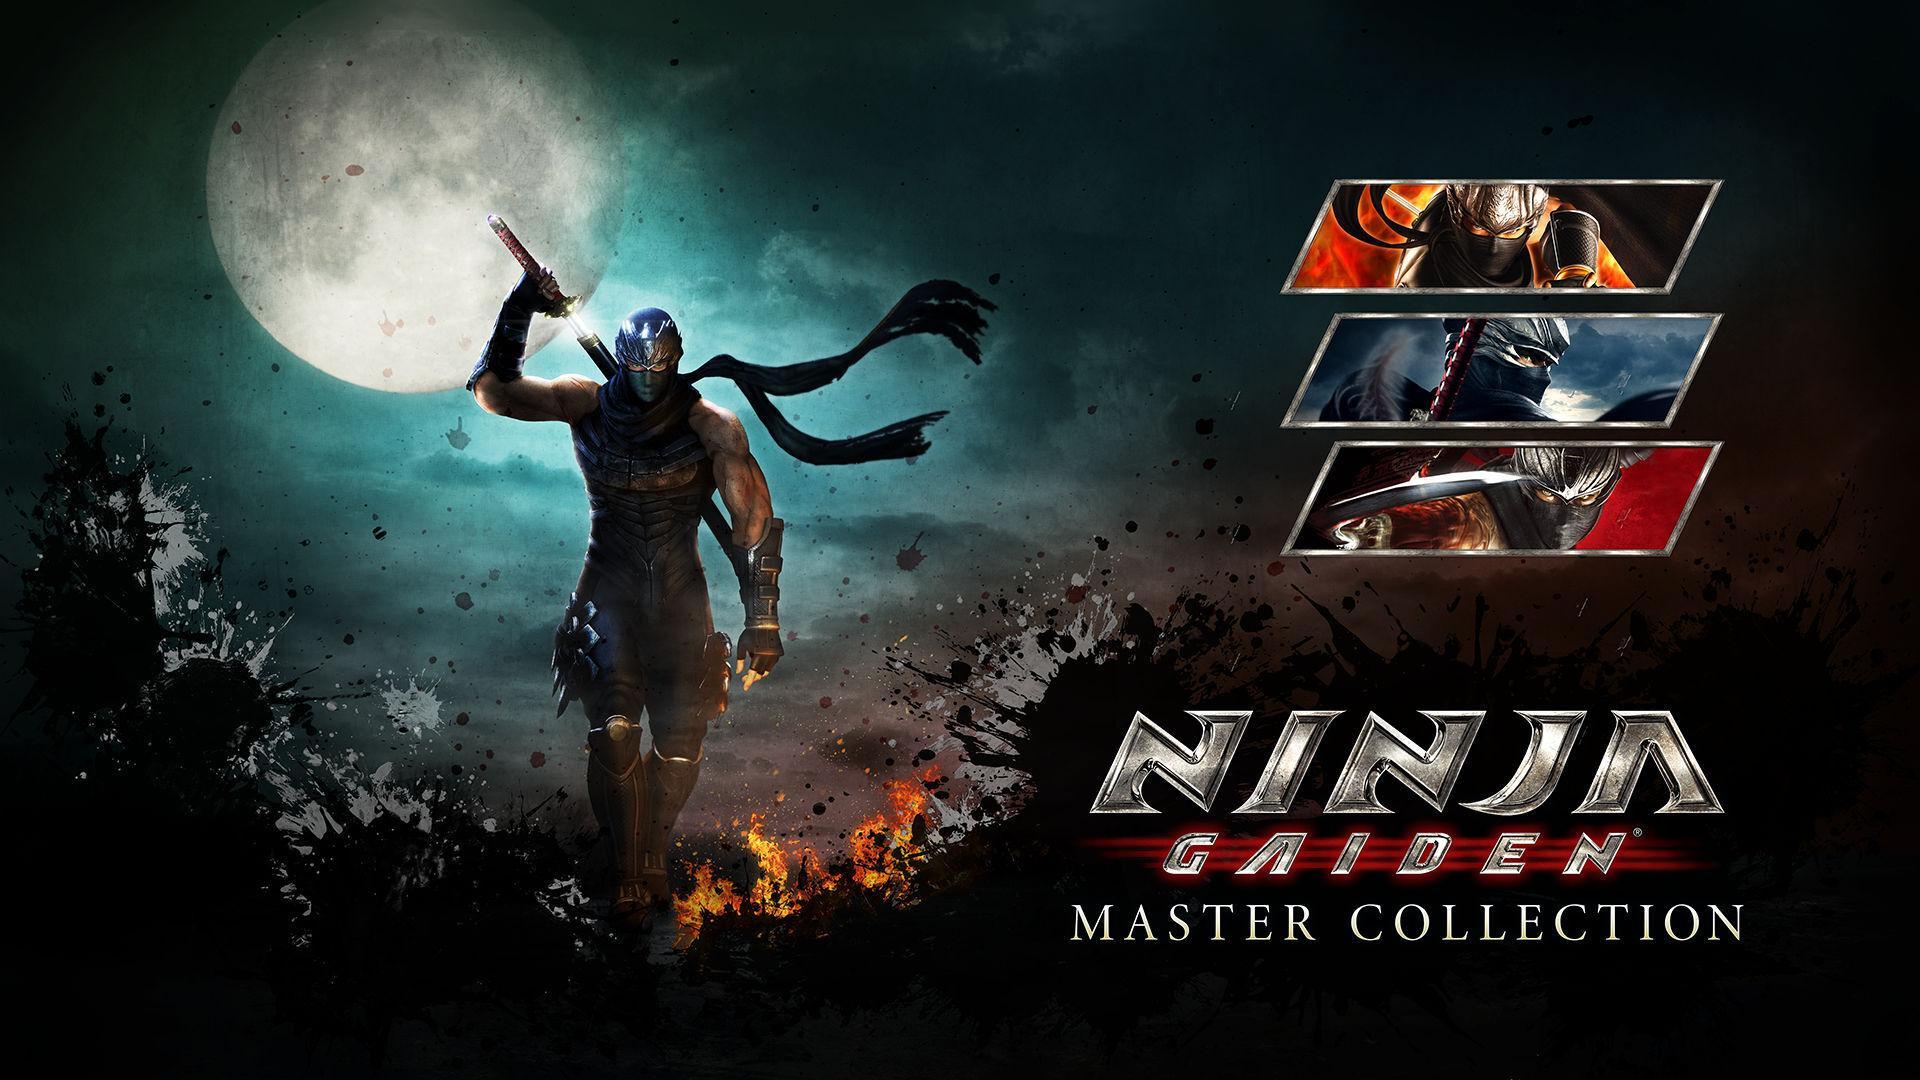 ninja-gaiden-master-collection-switch-hero